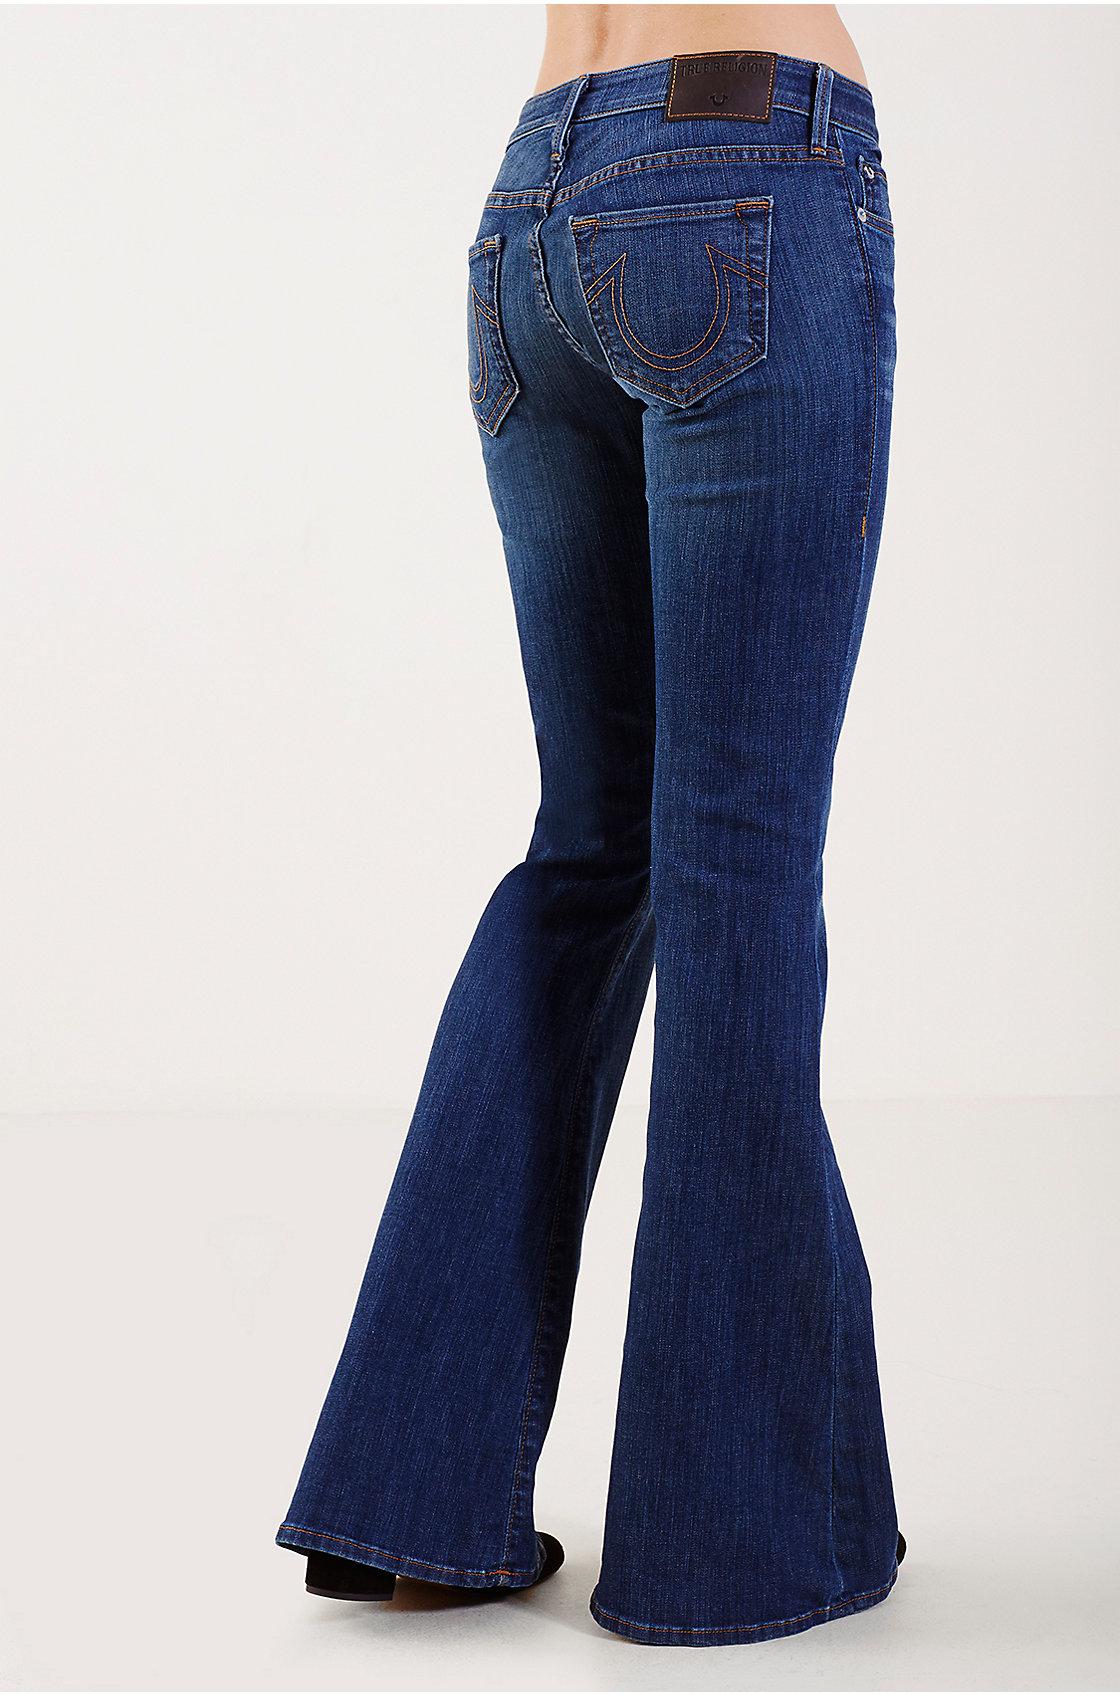 True religion Flare Bell Bottom (short Inseam) Womens Jean in Blue ...